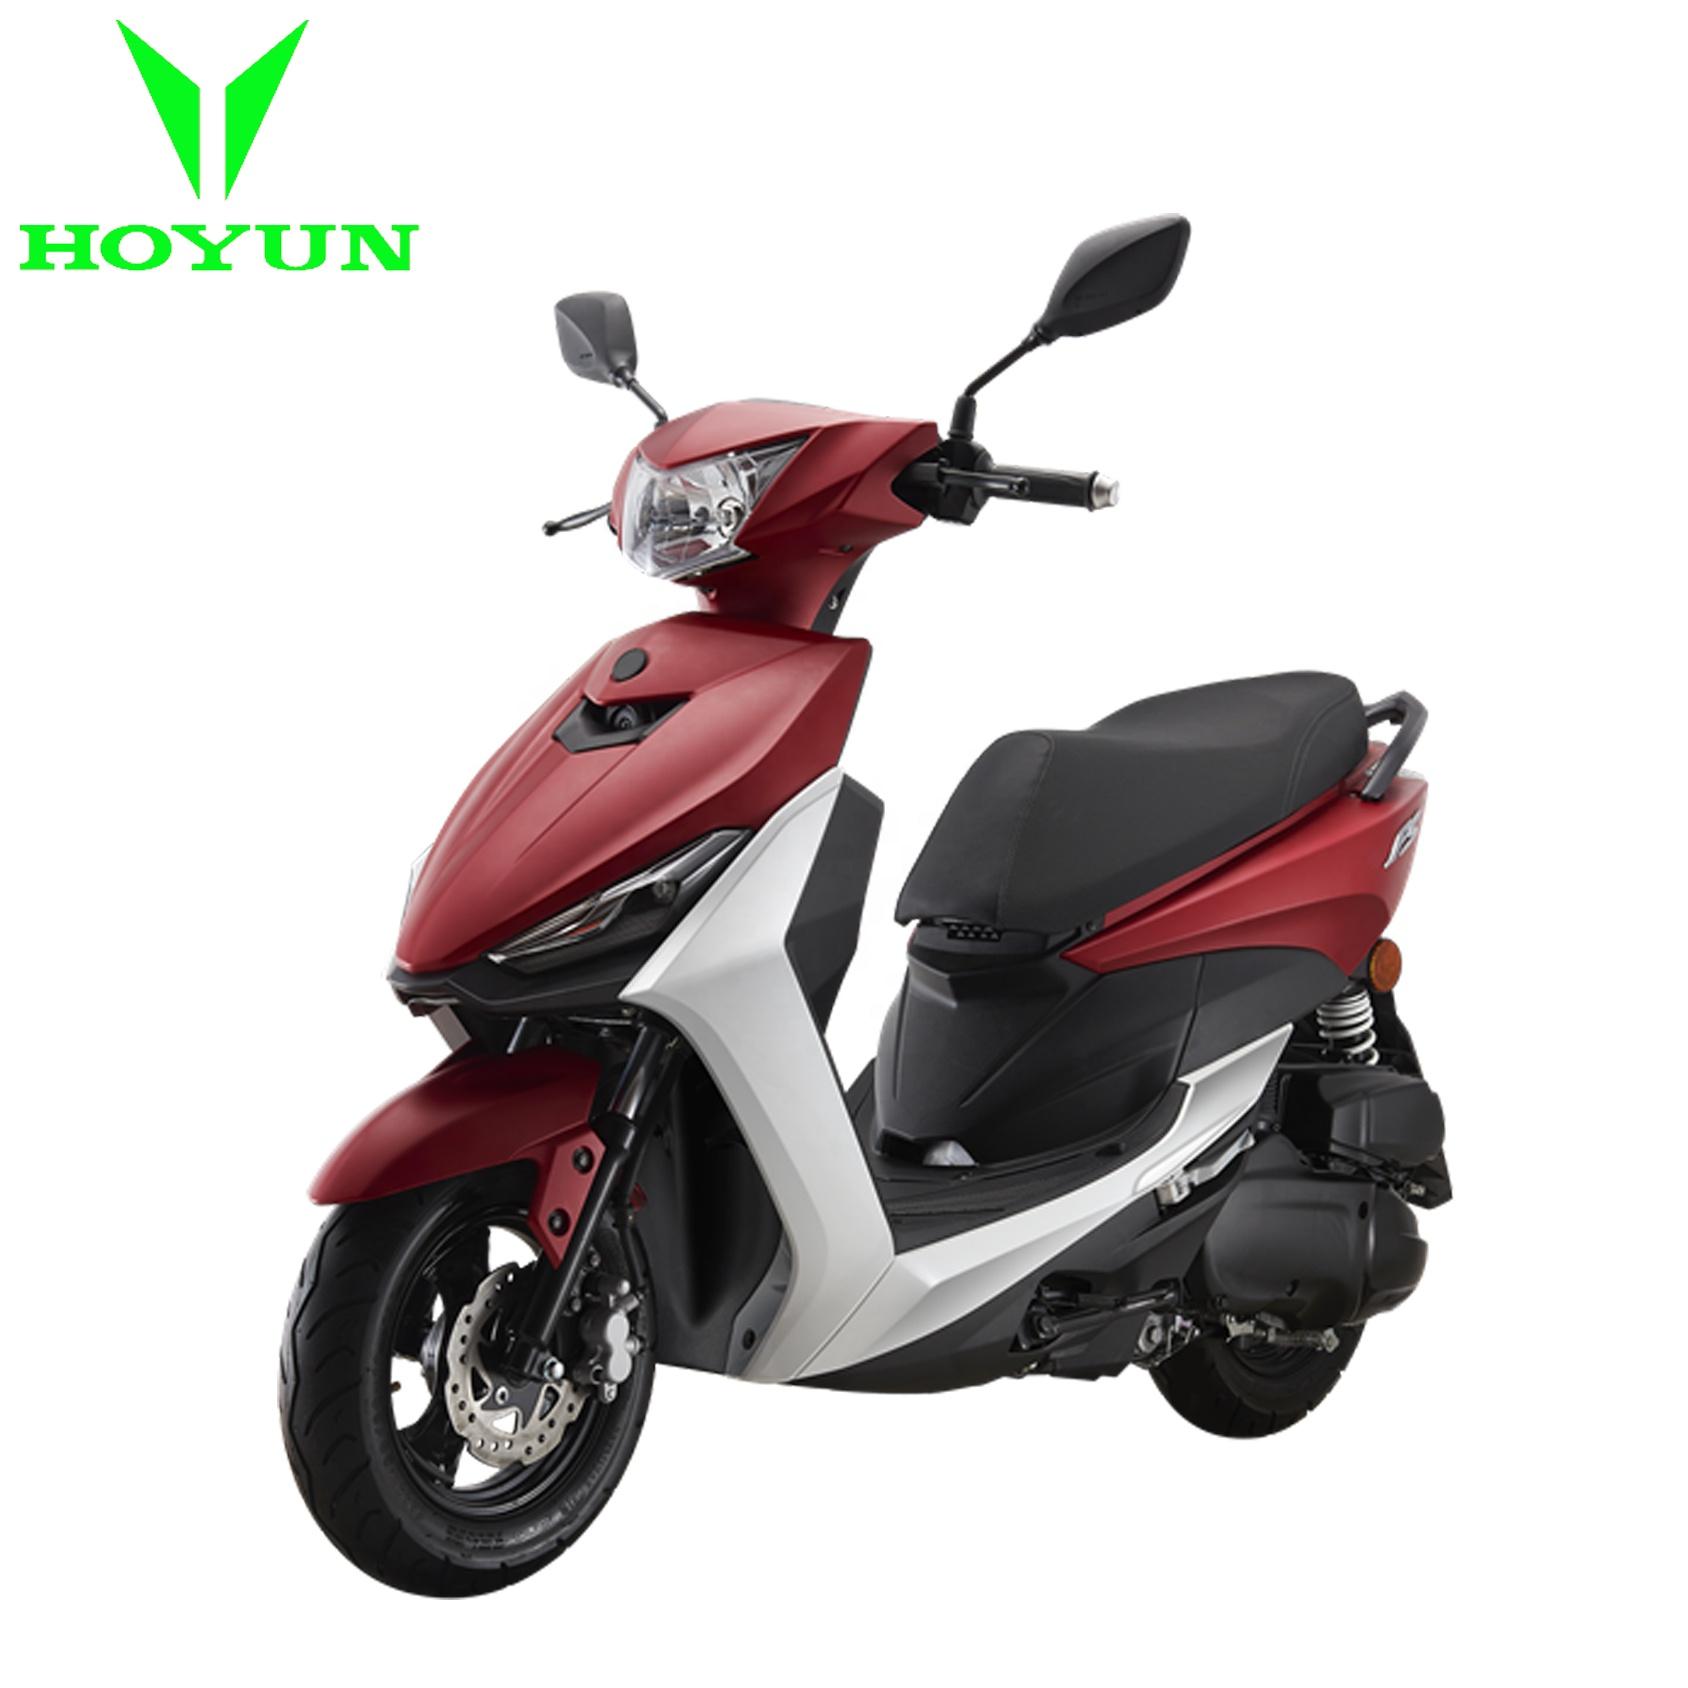 With Linhai Yamaha Engine Lebanon Latin America Bolivia Peru Hoyun Pegasus  Sumo Akkad Motoline Motonel Fenix Jog Fs Motorcycle - Buy